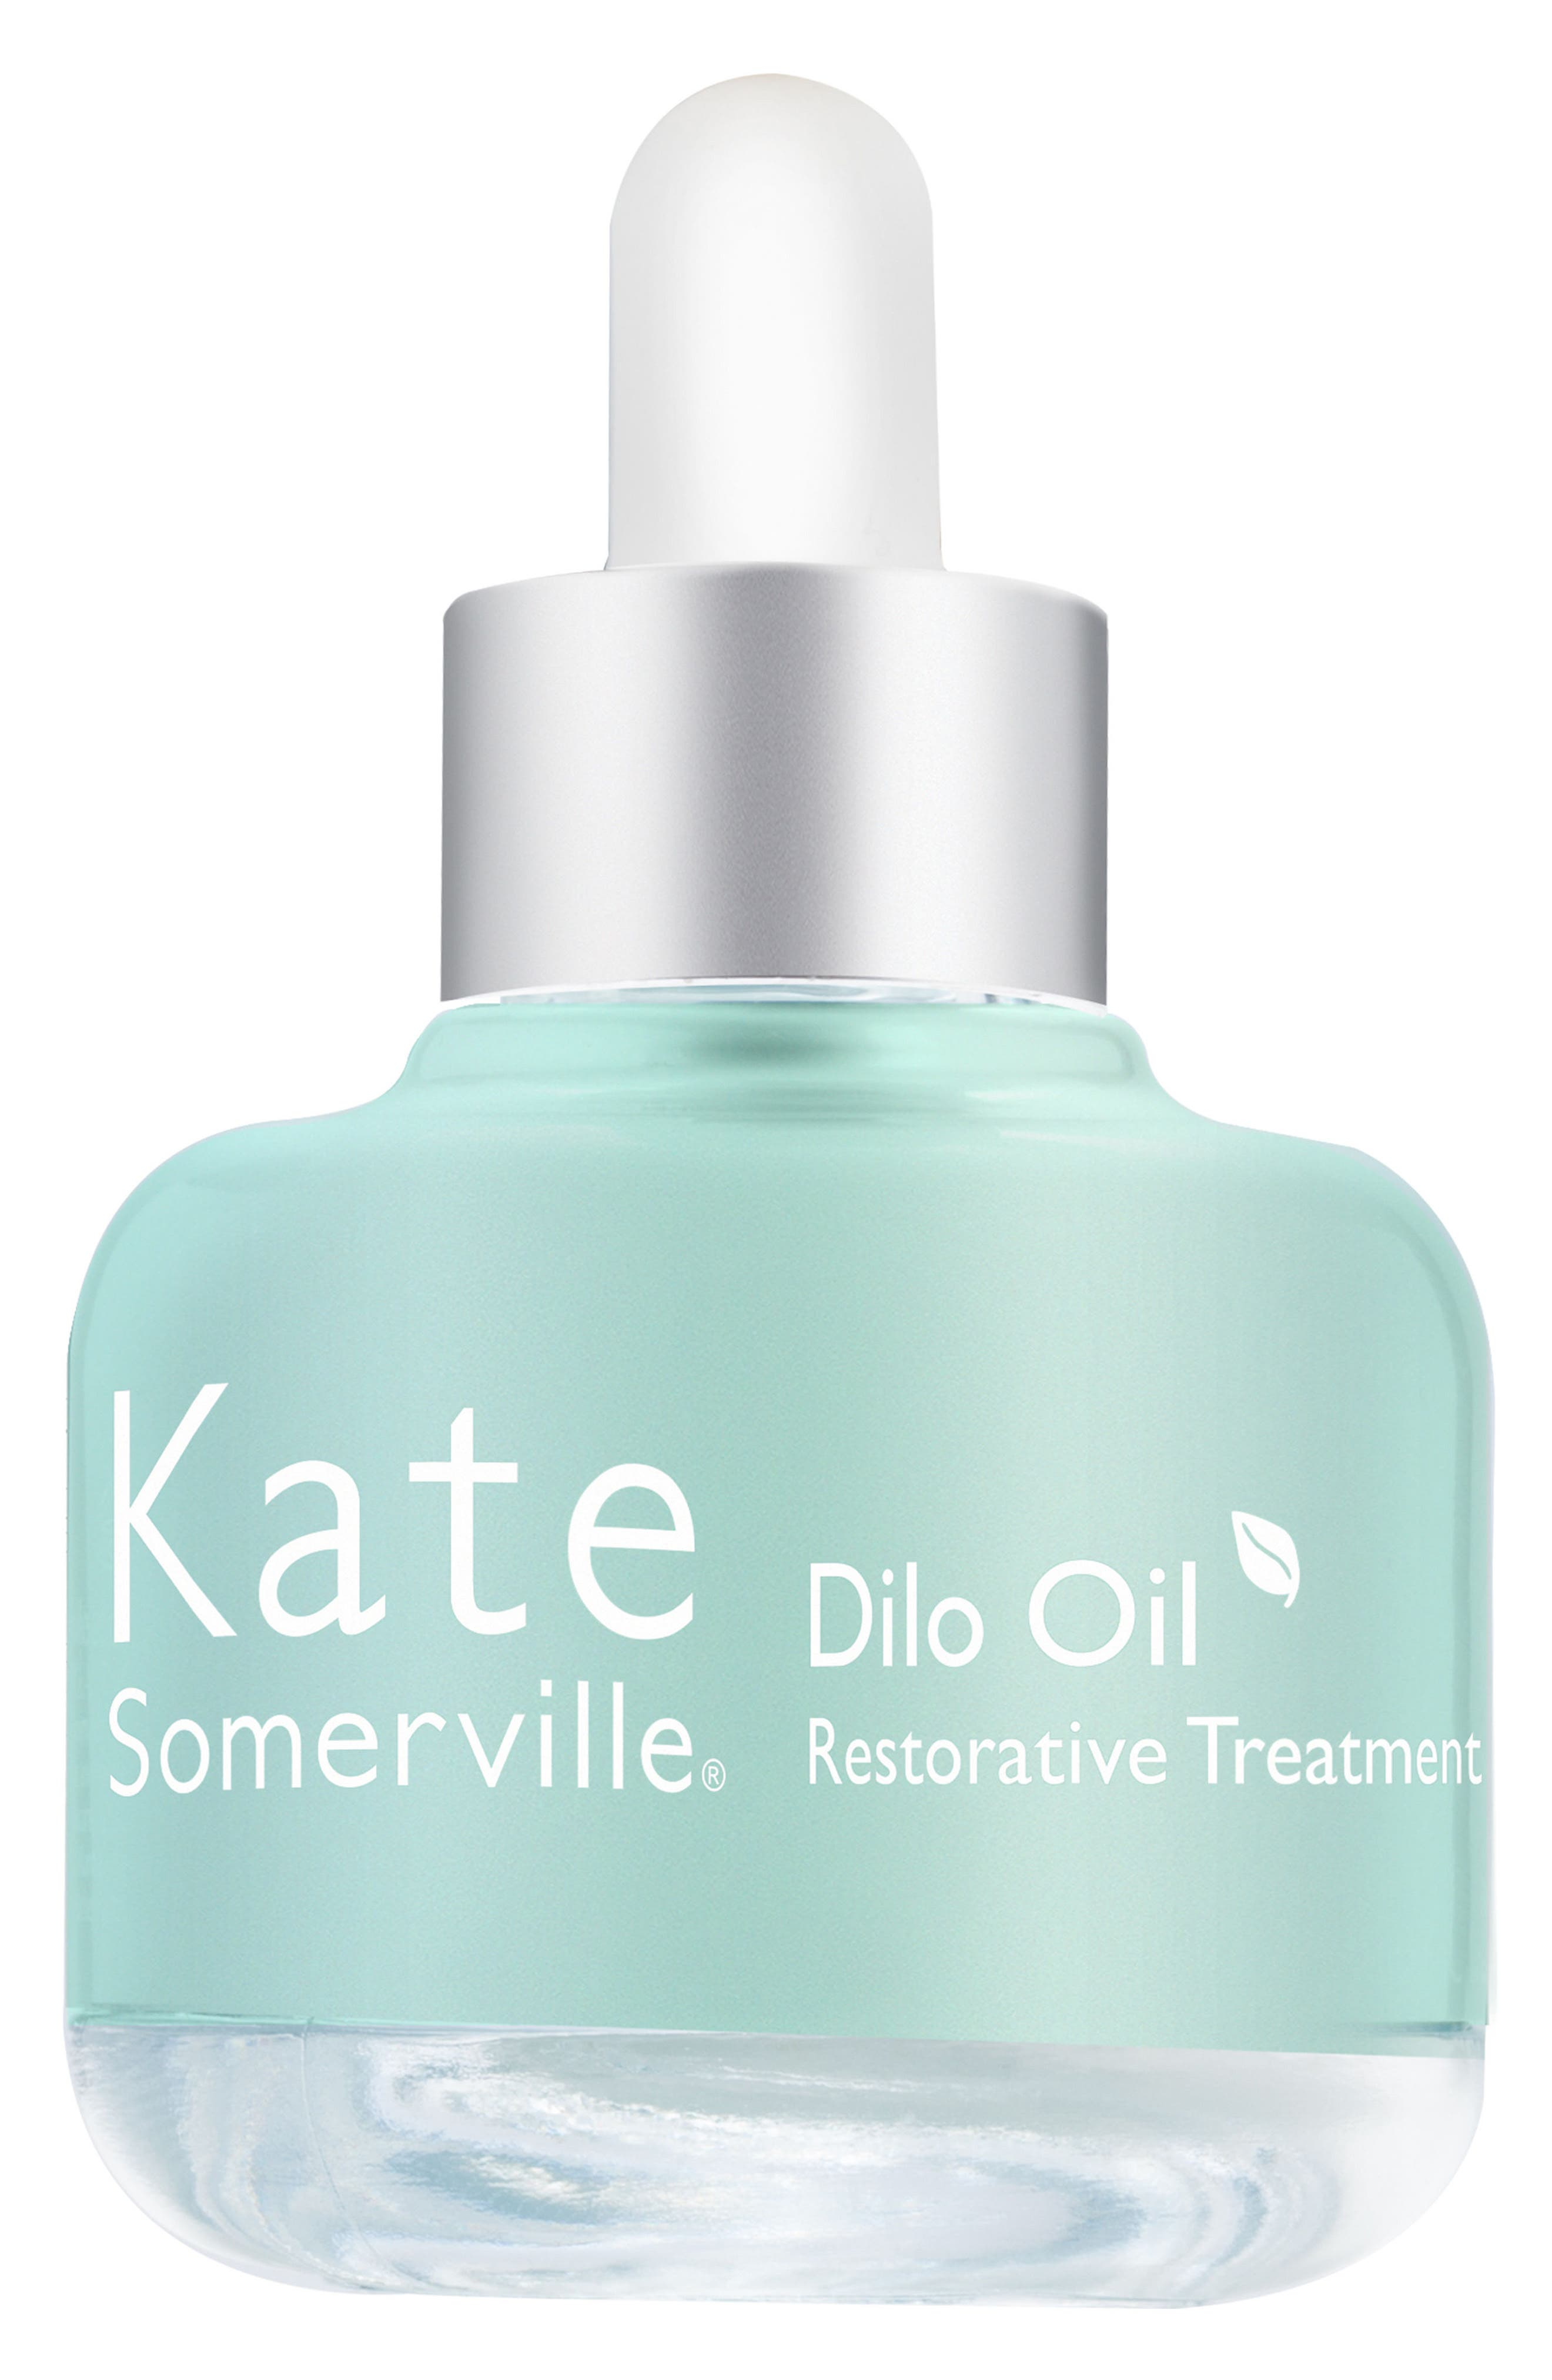 Alternate Image 1 Selected - Kate Somerville® Dilo Oil Restorative Treatment